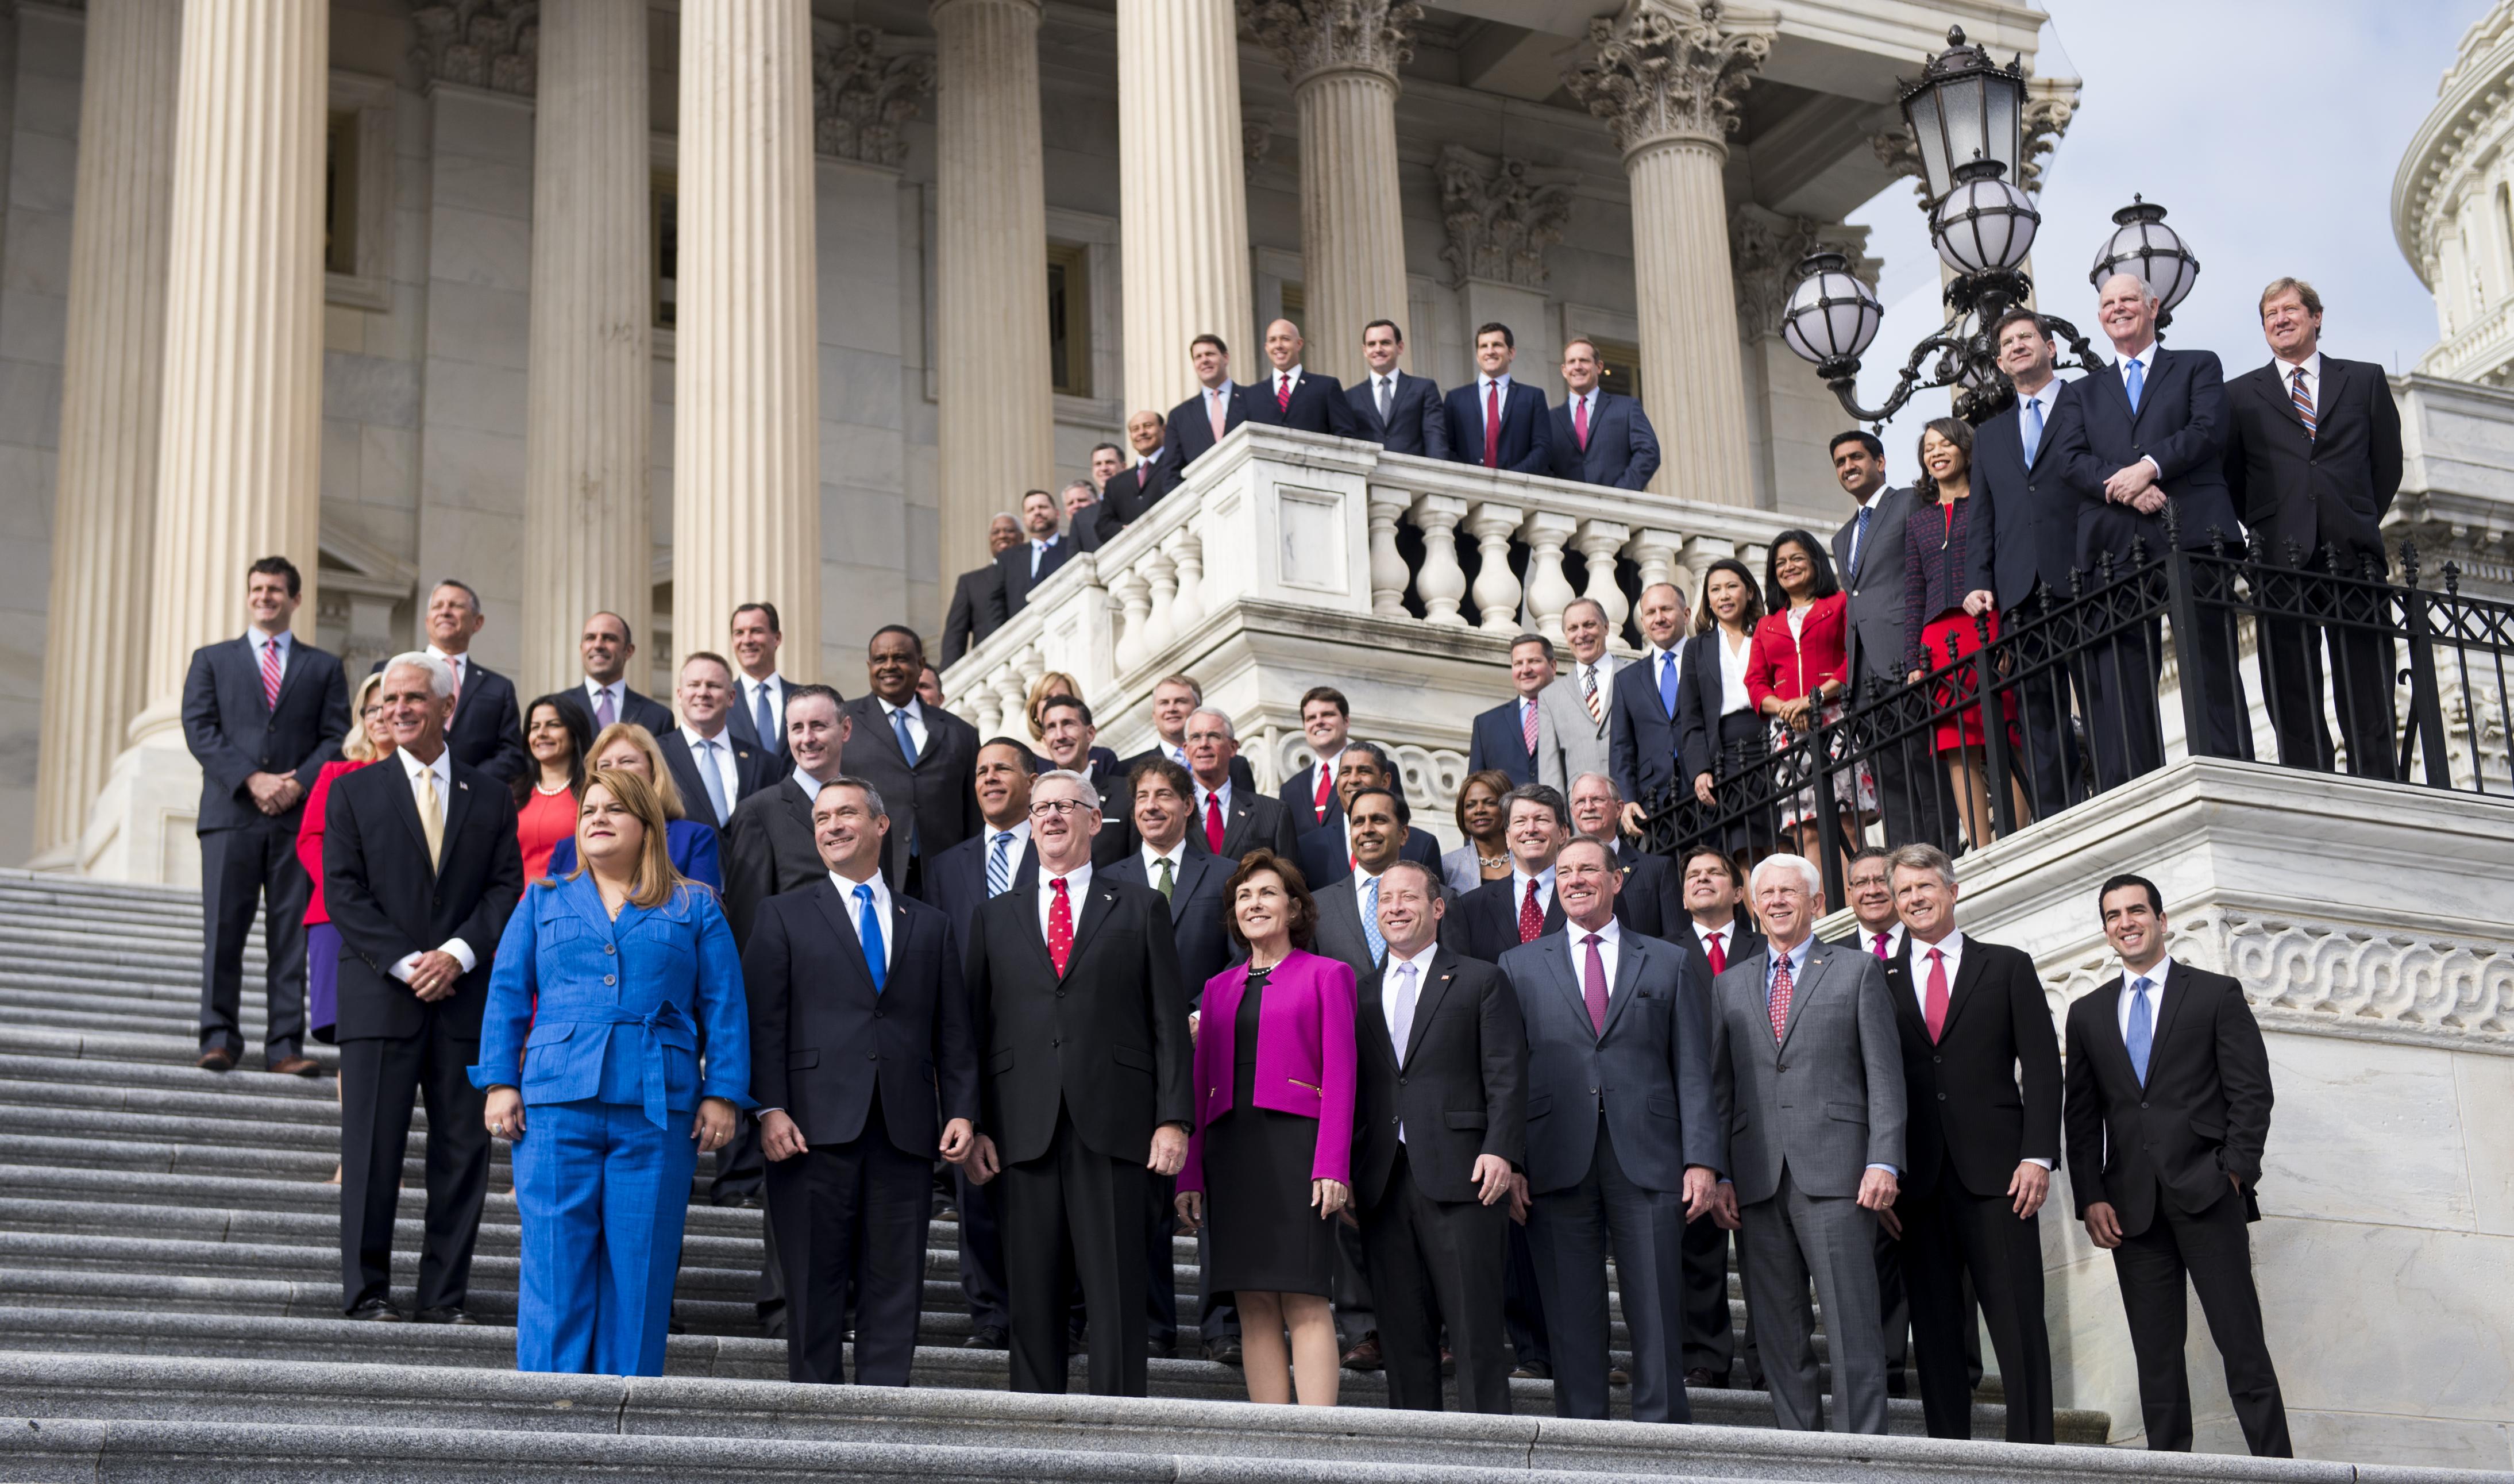 New Congress, same massive gender disparity